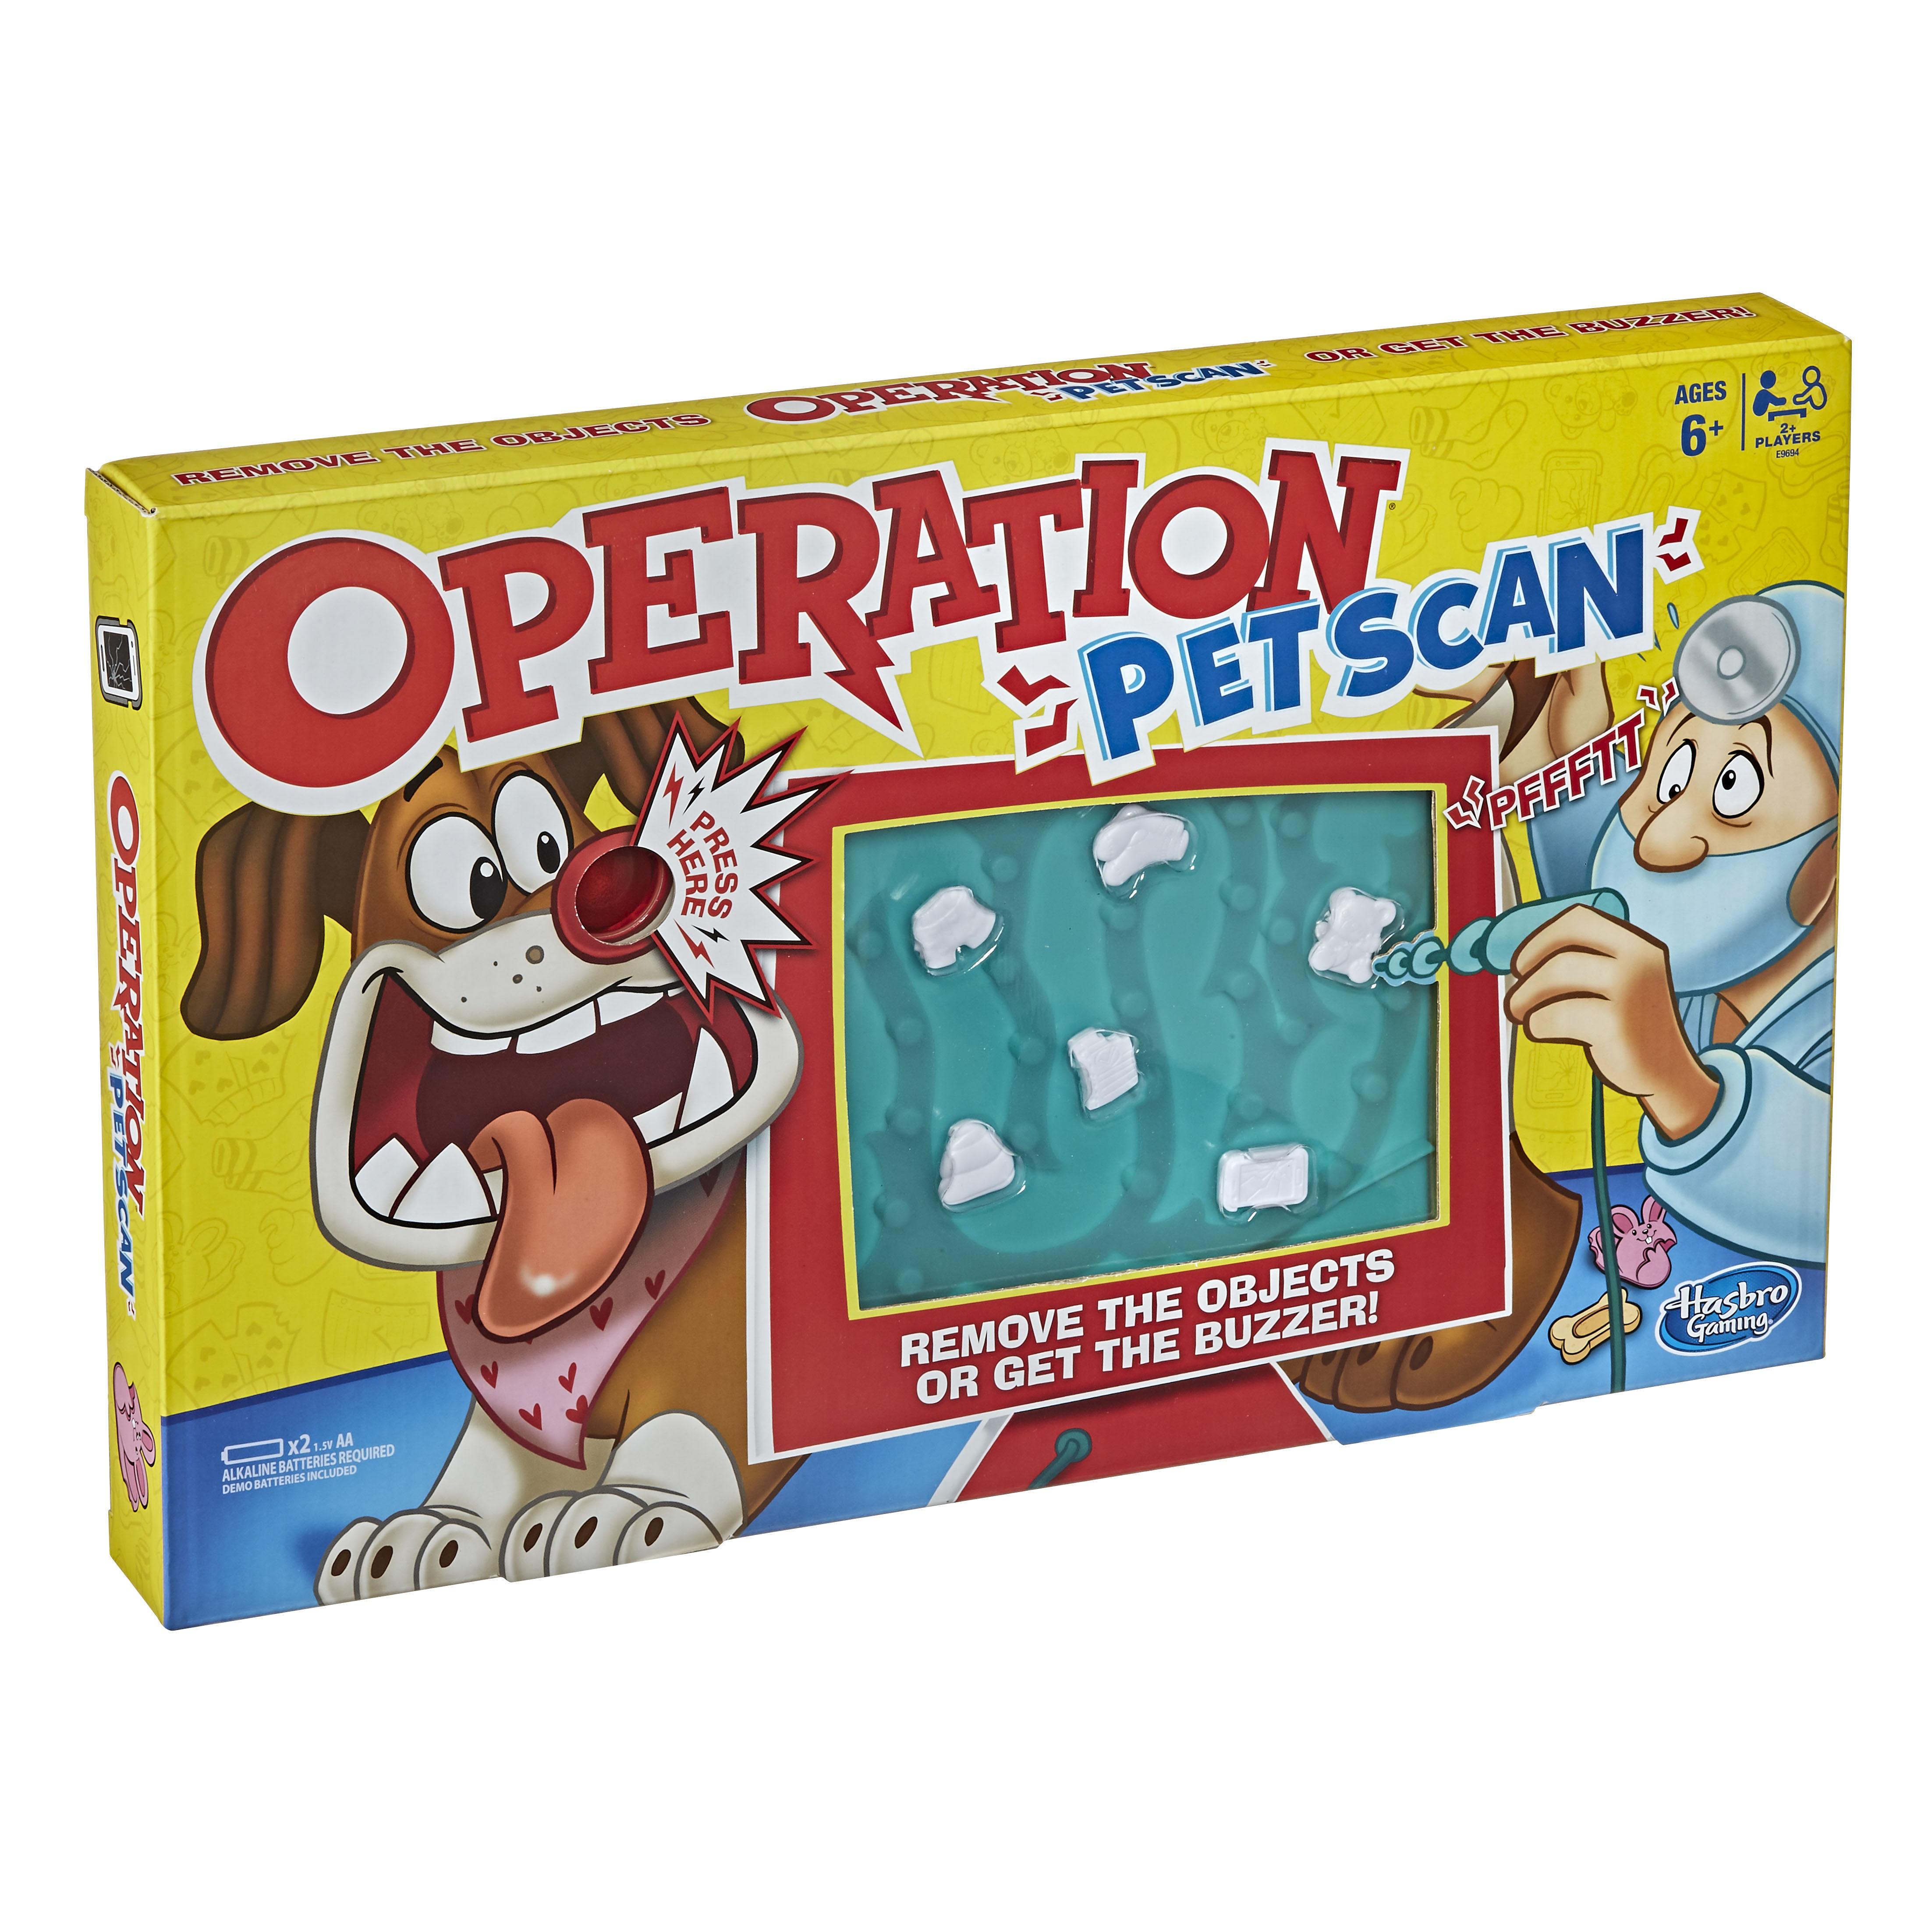 E9694 Operation Pet Scan